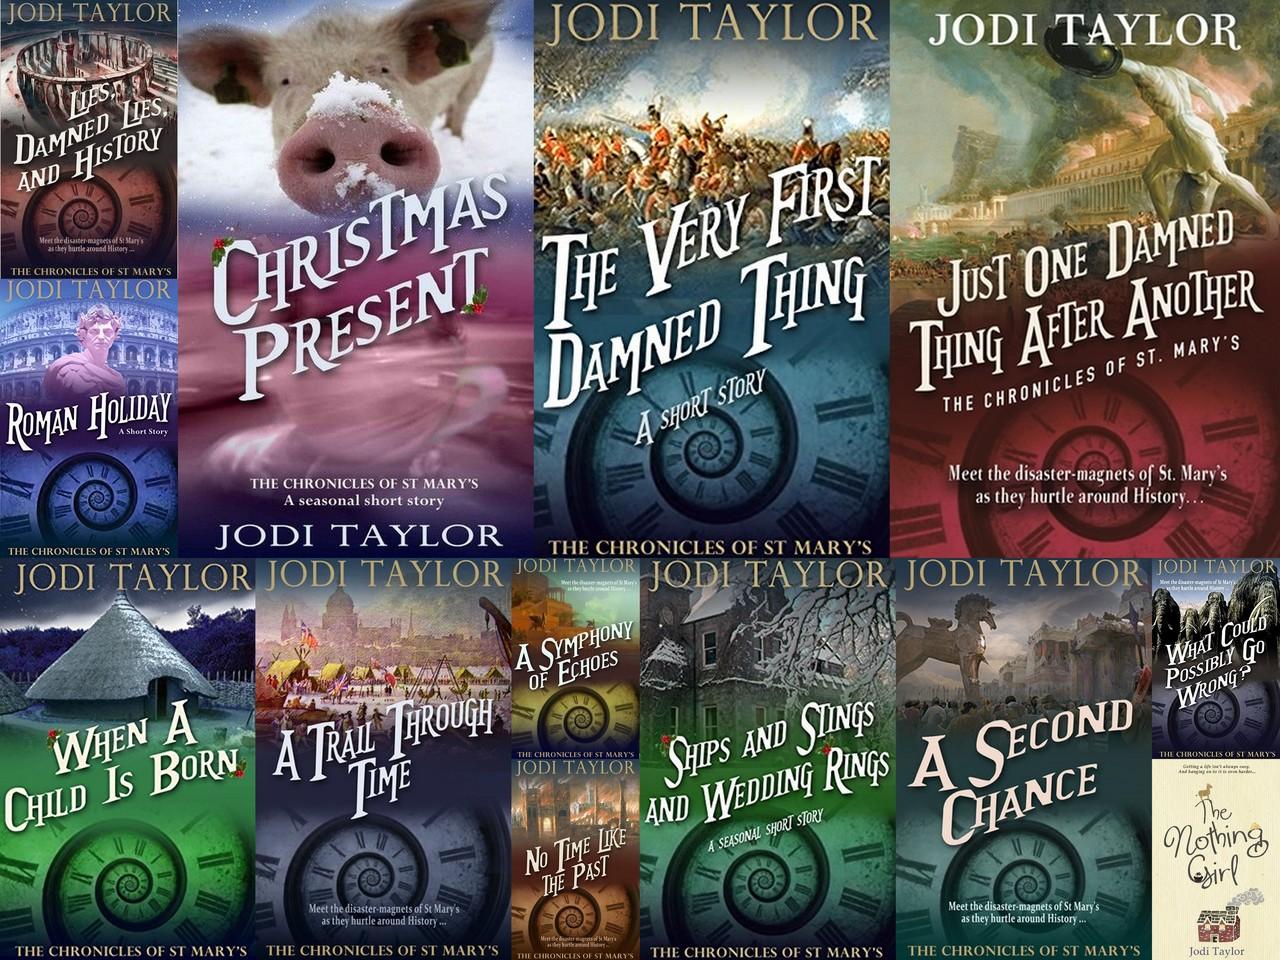 Jodi Taylor - Collection